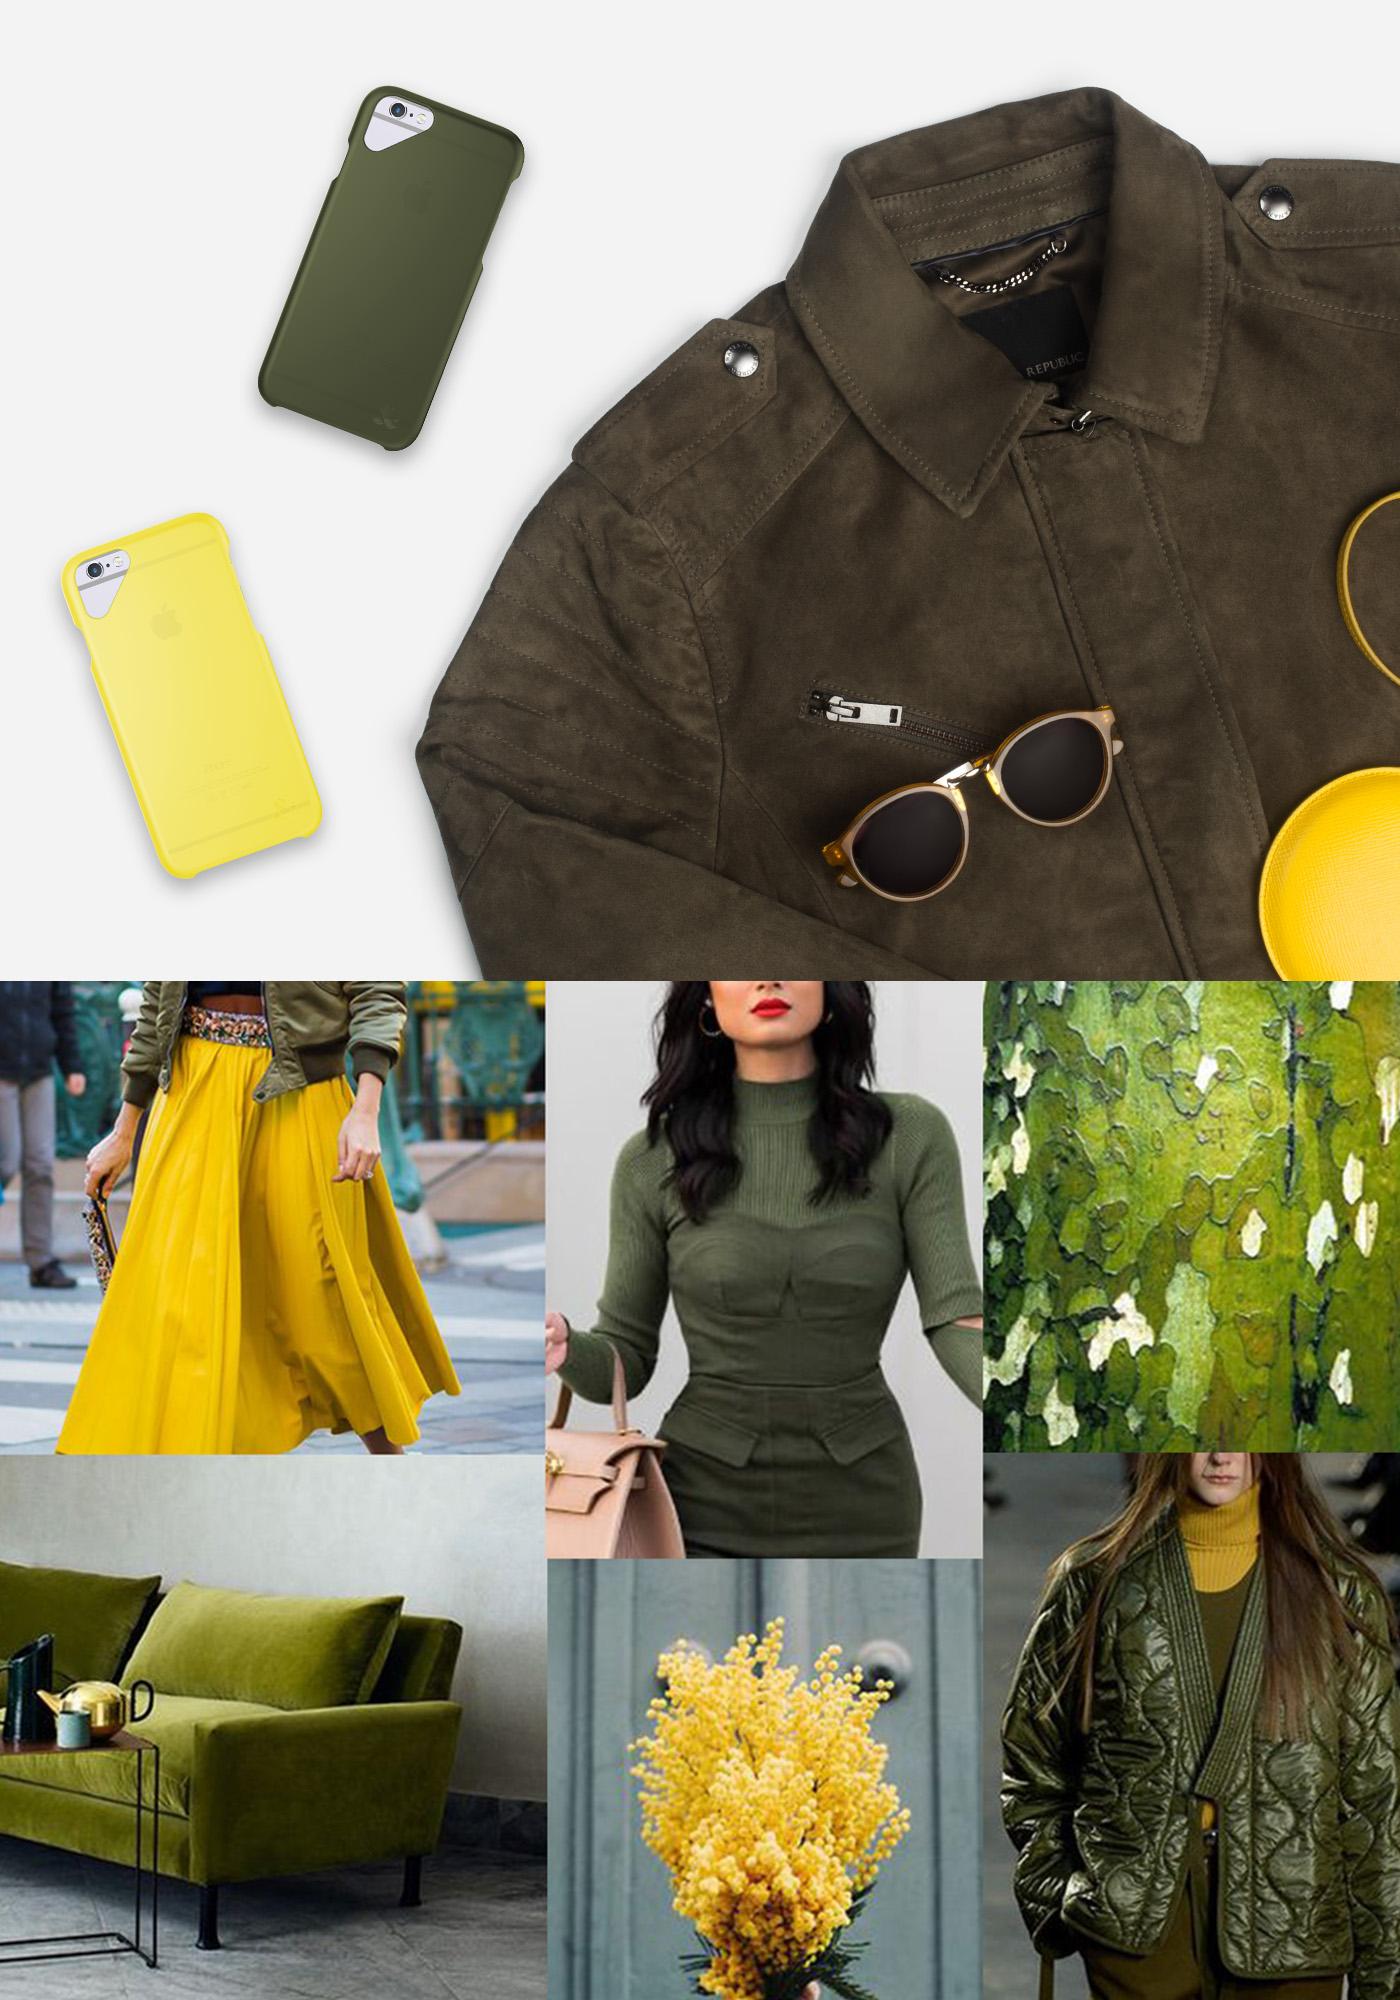 Styledumonde.com, @thebirdcageboutique, Silvia Patricia Balaguer, Forrest Glover Design, SFgirlbybay.com, Phillip Lim